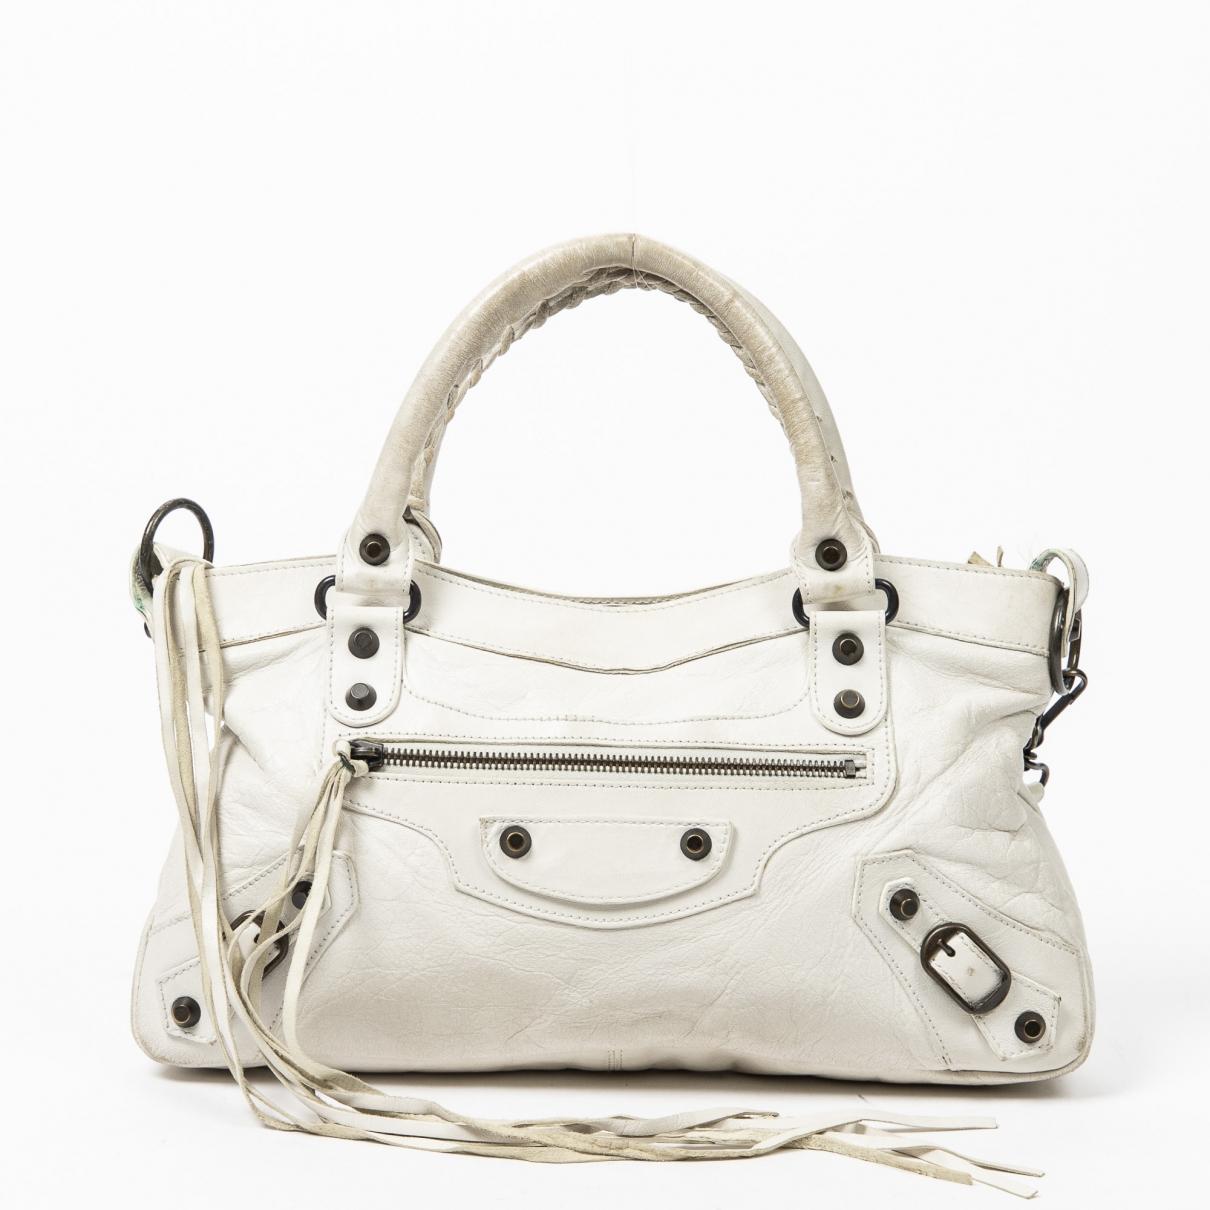 Balenciaga \N Handtasche in  Weiss Leder